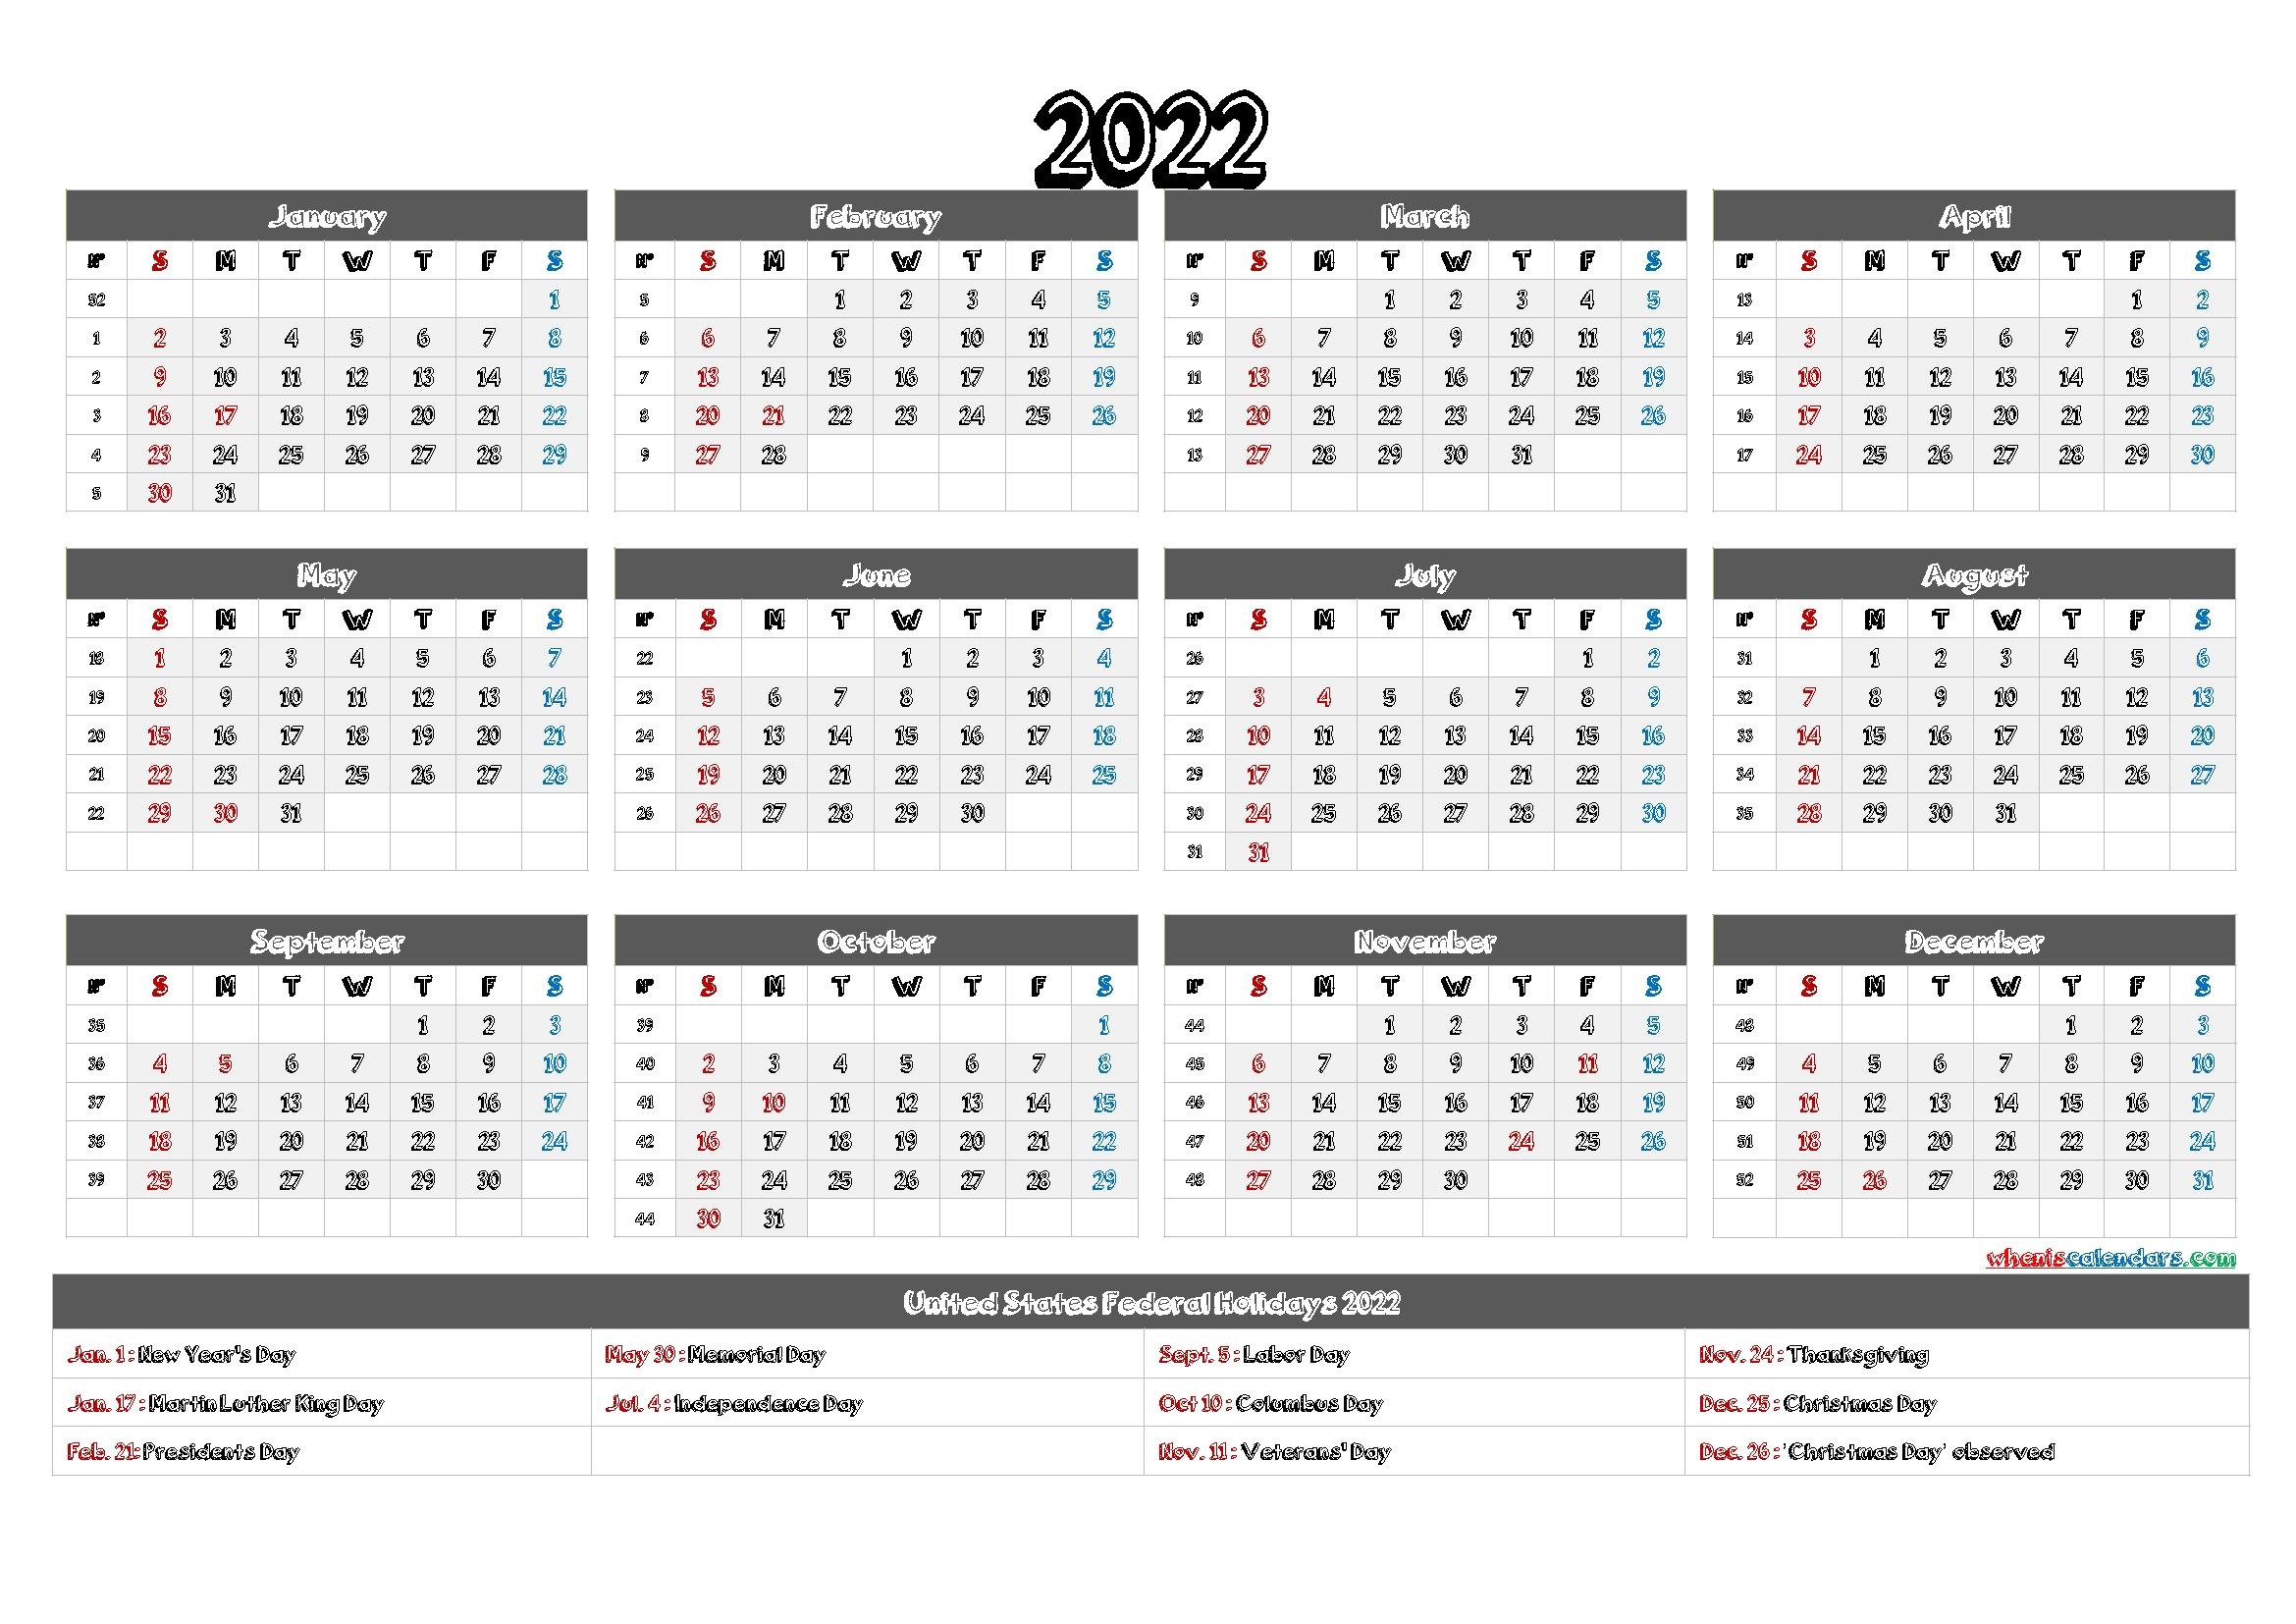 2022 calendar printable pdf download yearly template::Download 2022 Printable Calendar